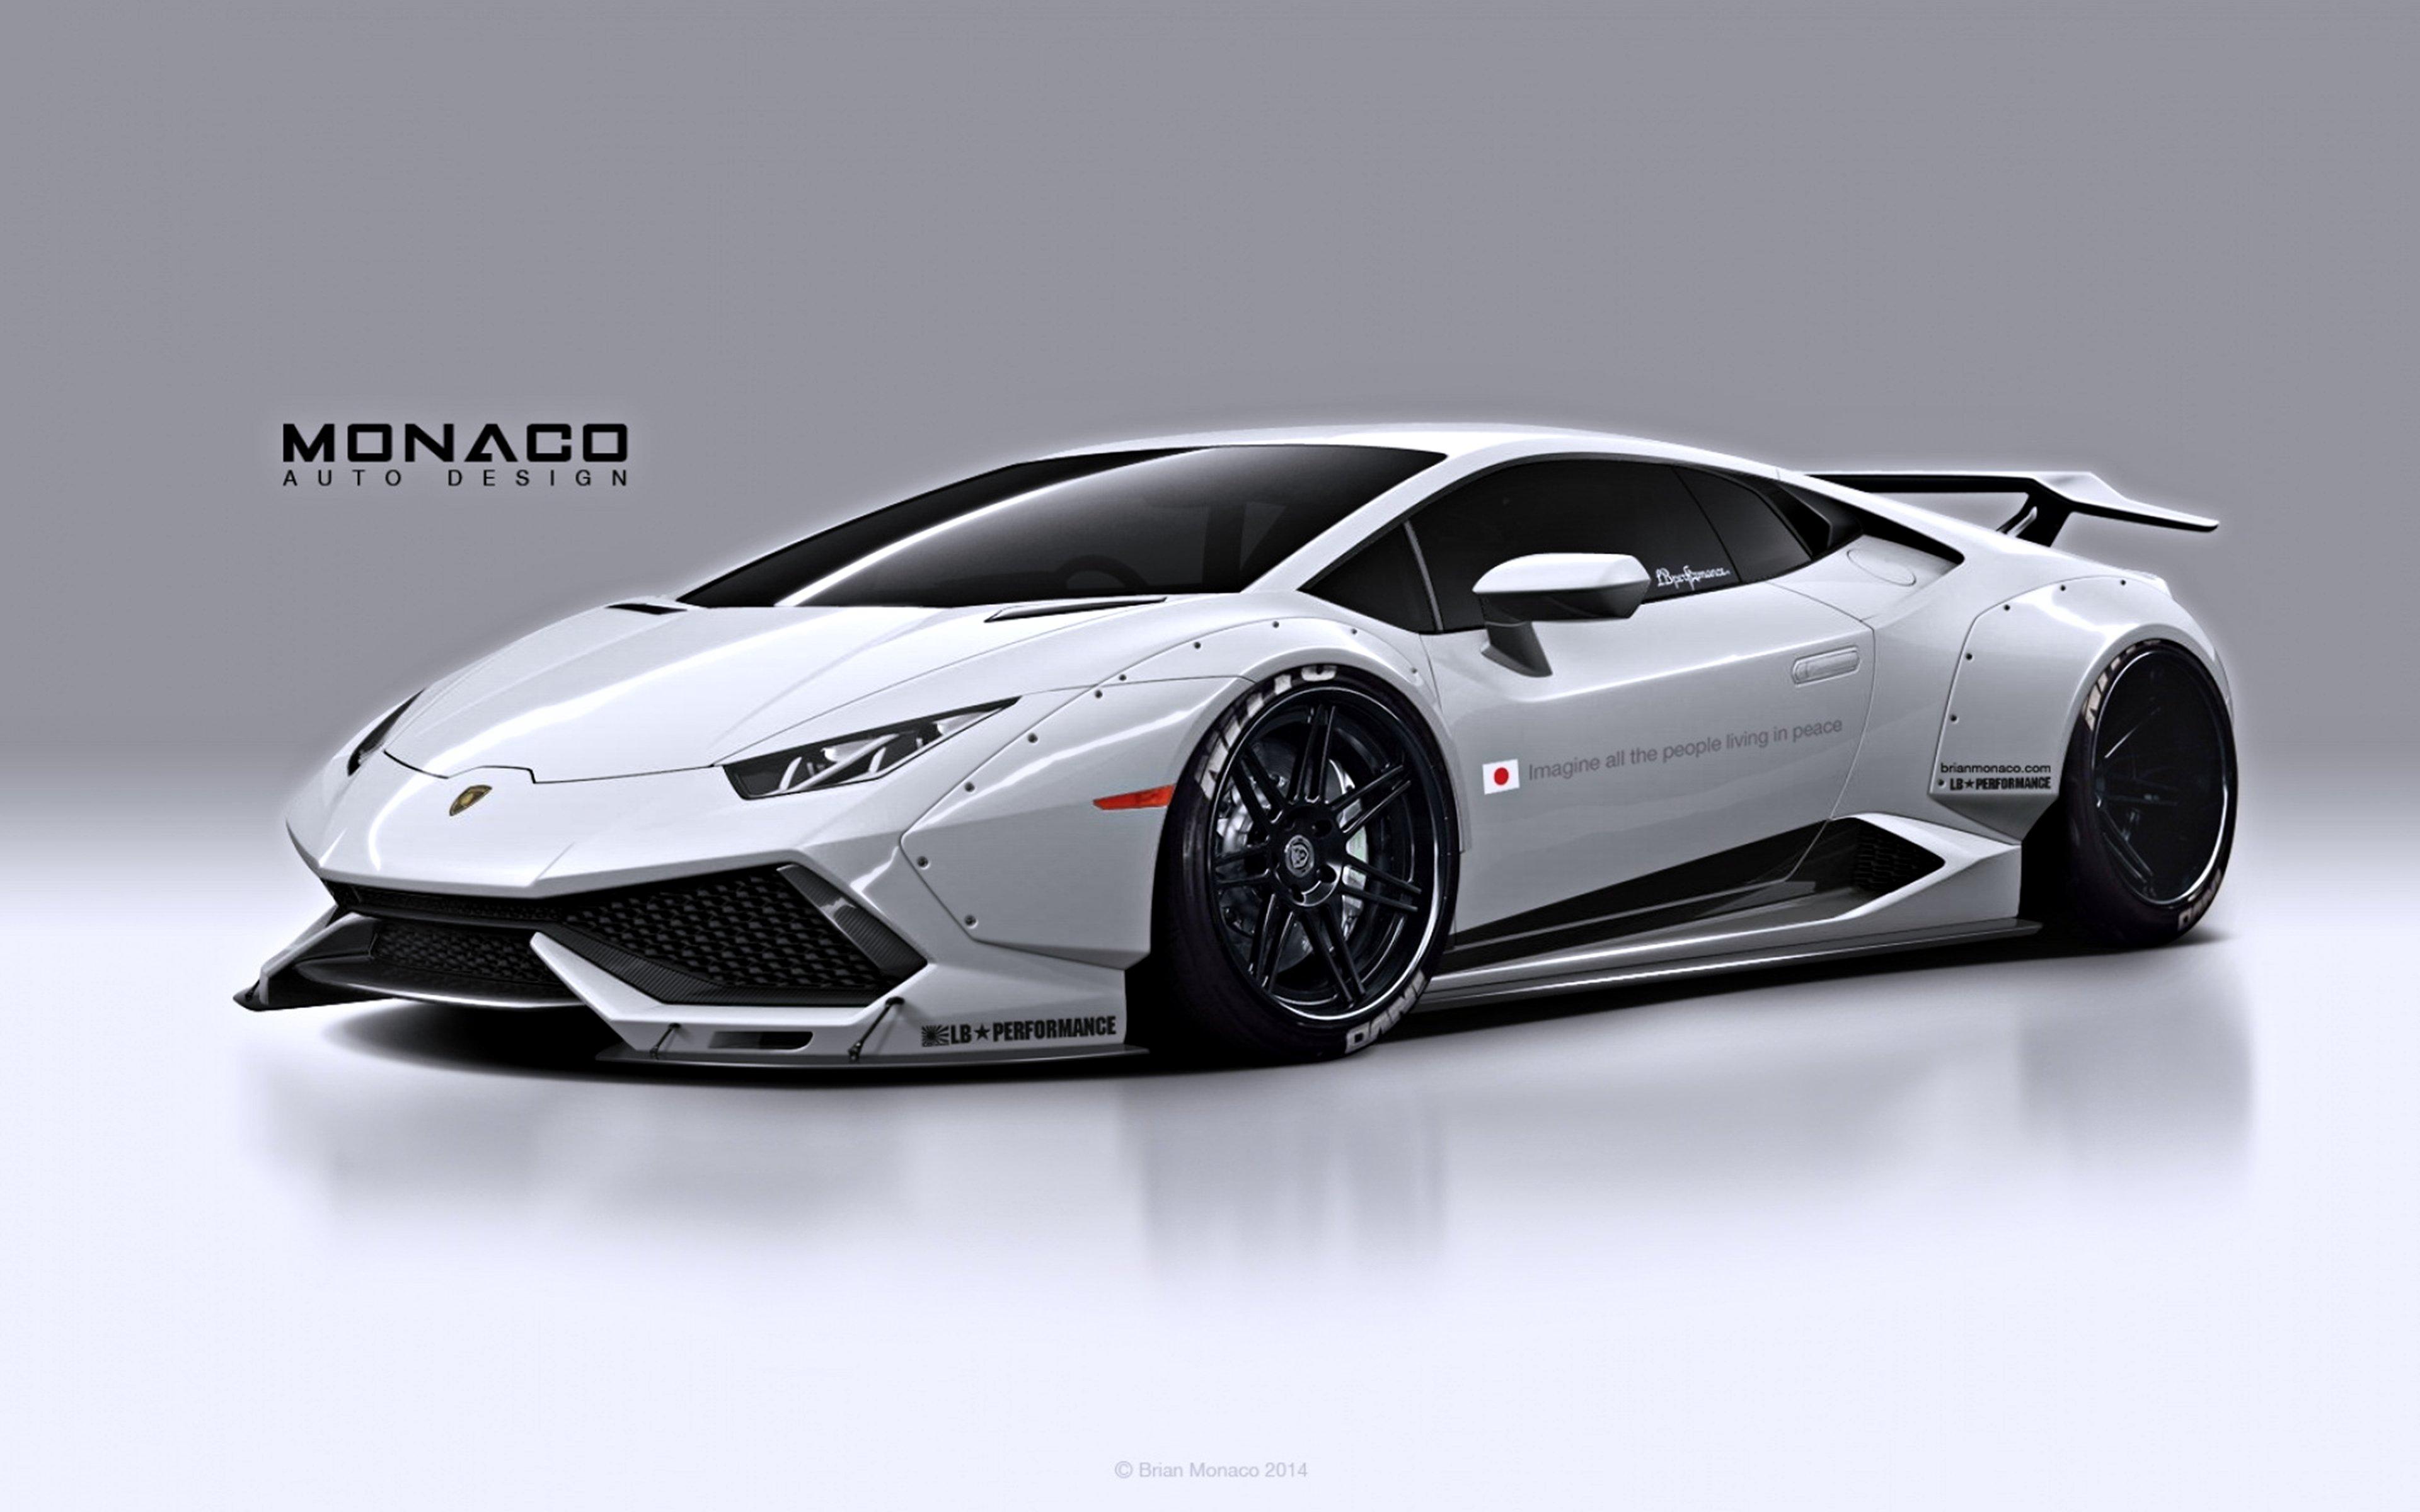 lamborghini huracan lp610 4 lb performance white speed motors force race cars wallpaper 3840x2400 622537 wallpaperup